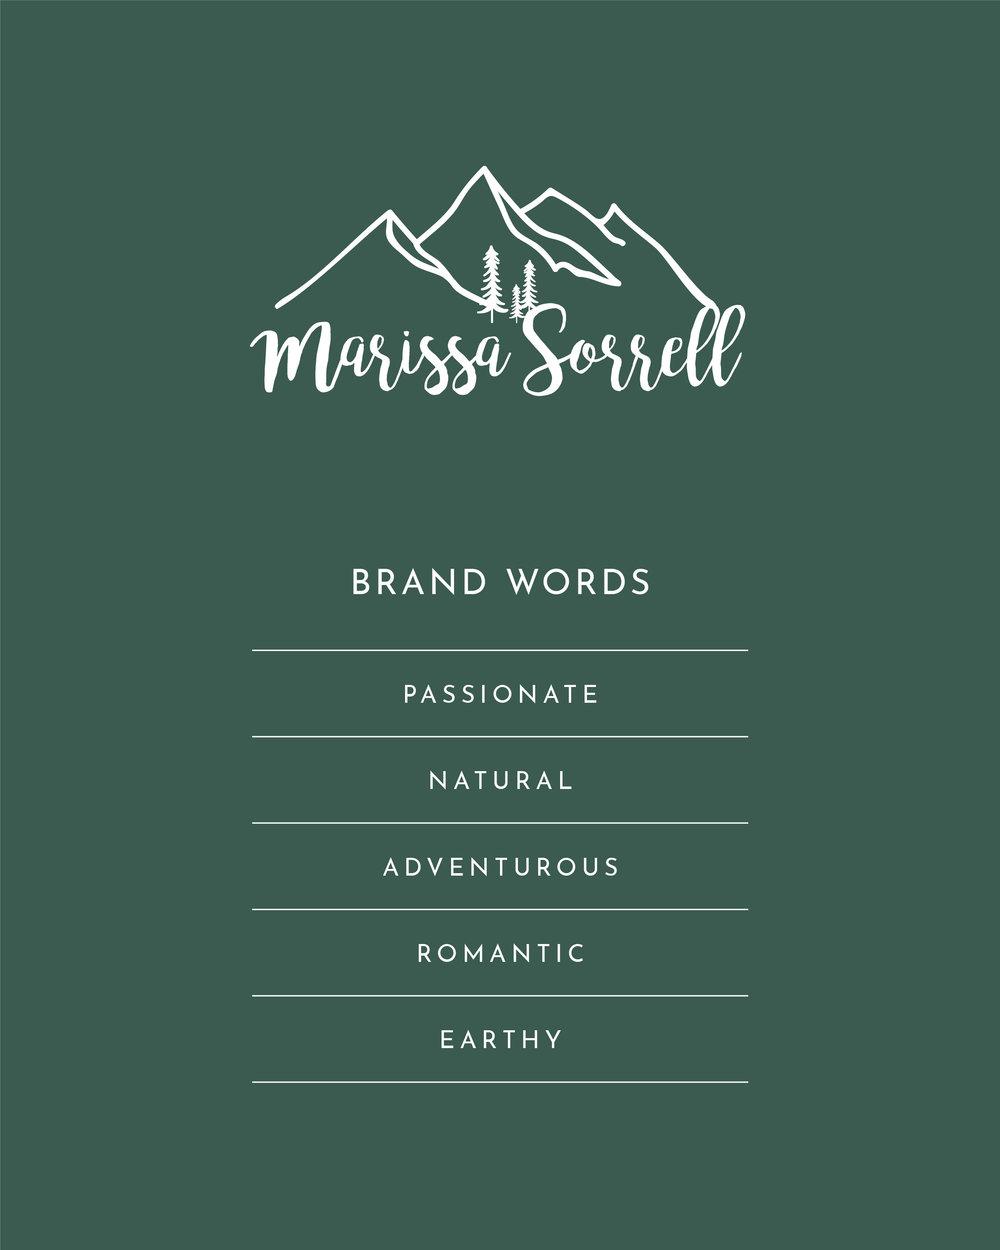 MS_portfolioai_BrandWords.jpg